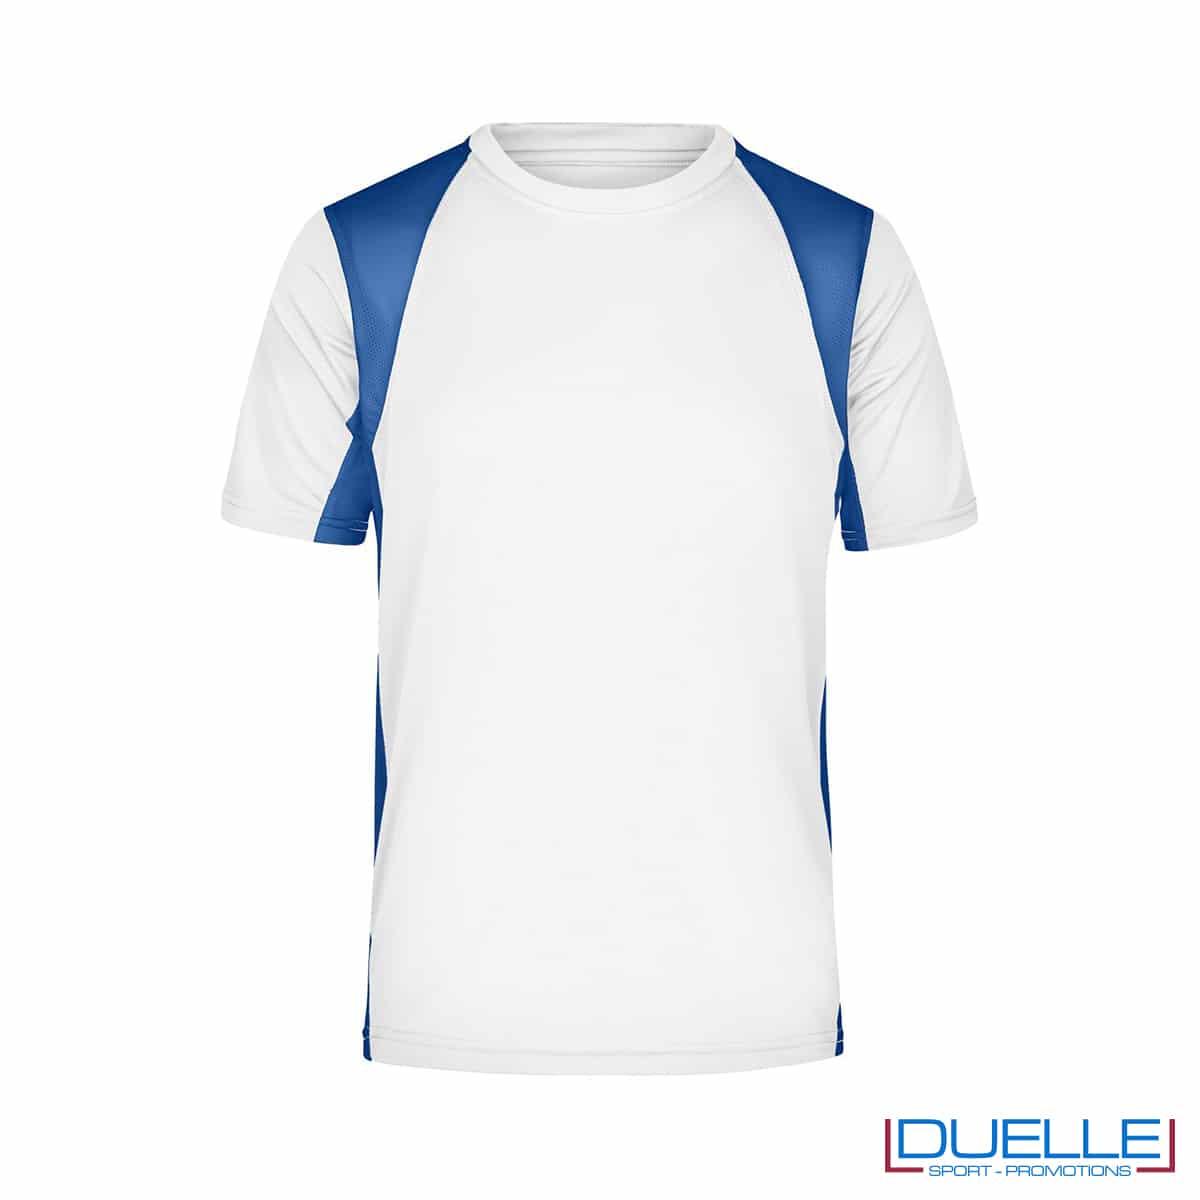 T-shirt running uomo personalizzata colore bianco-blu royal